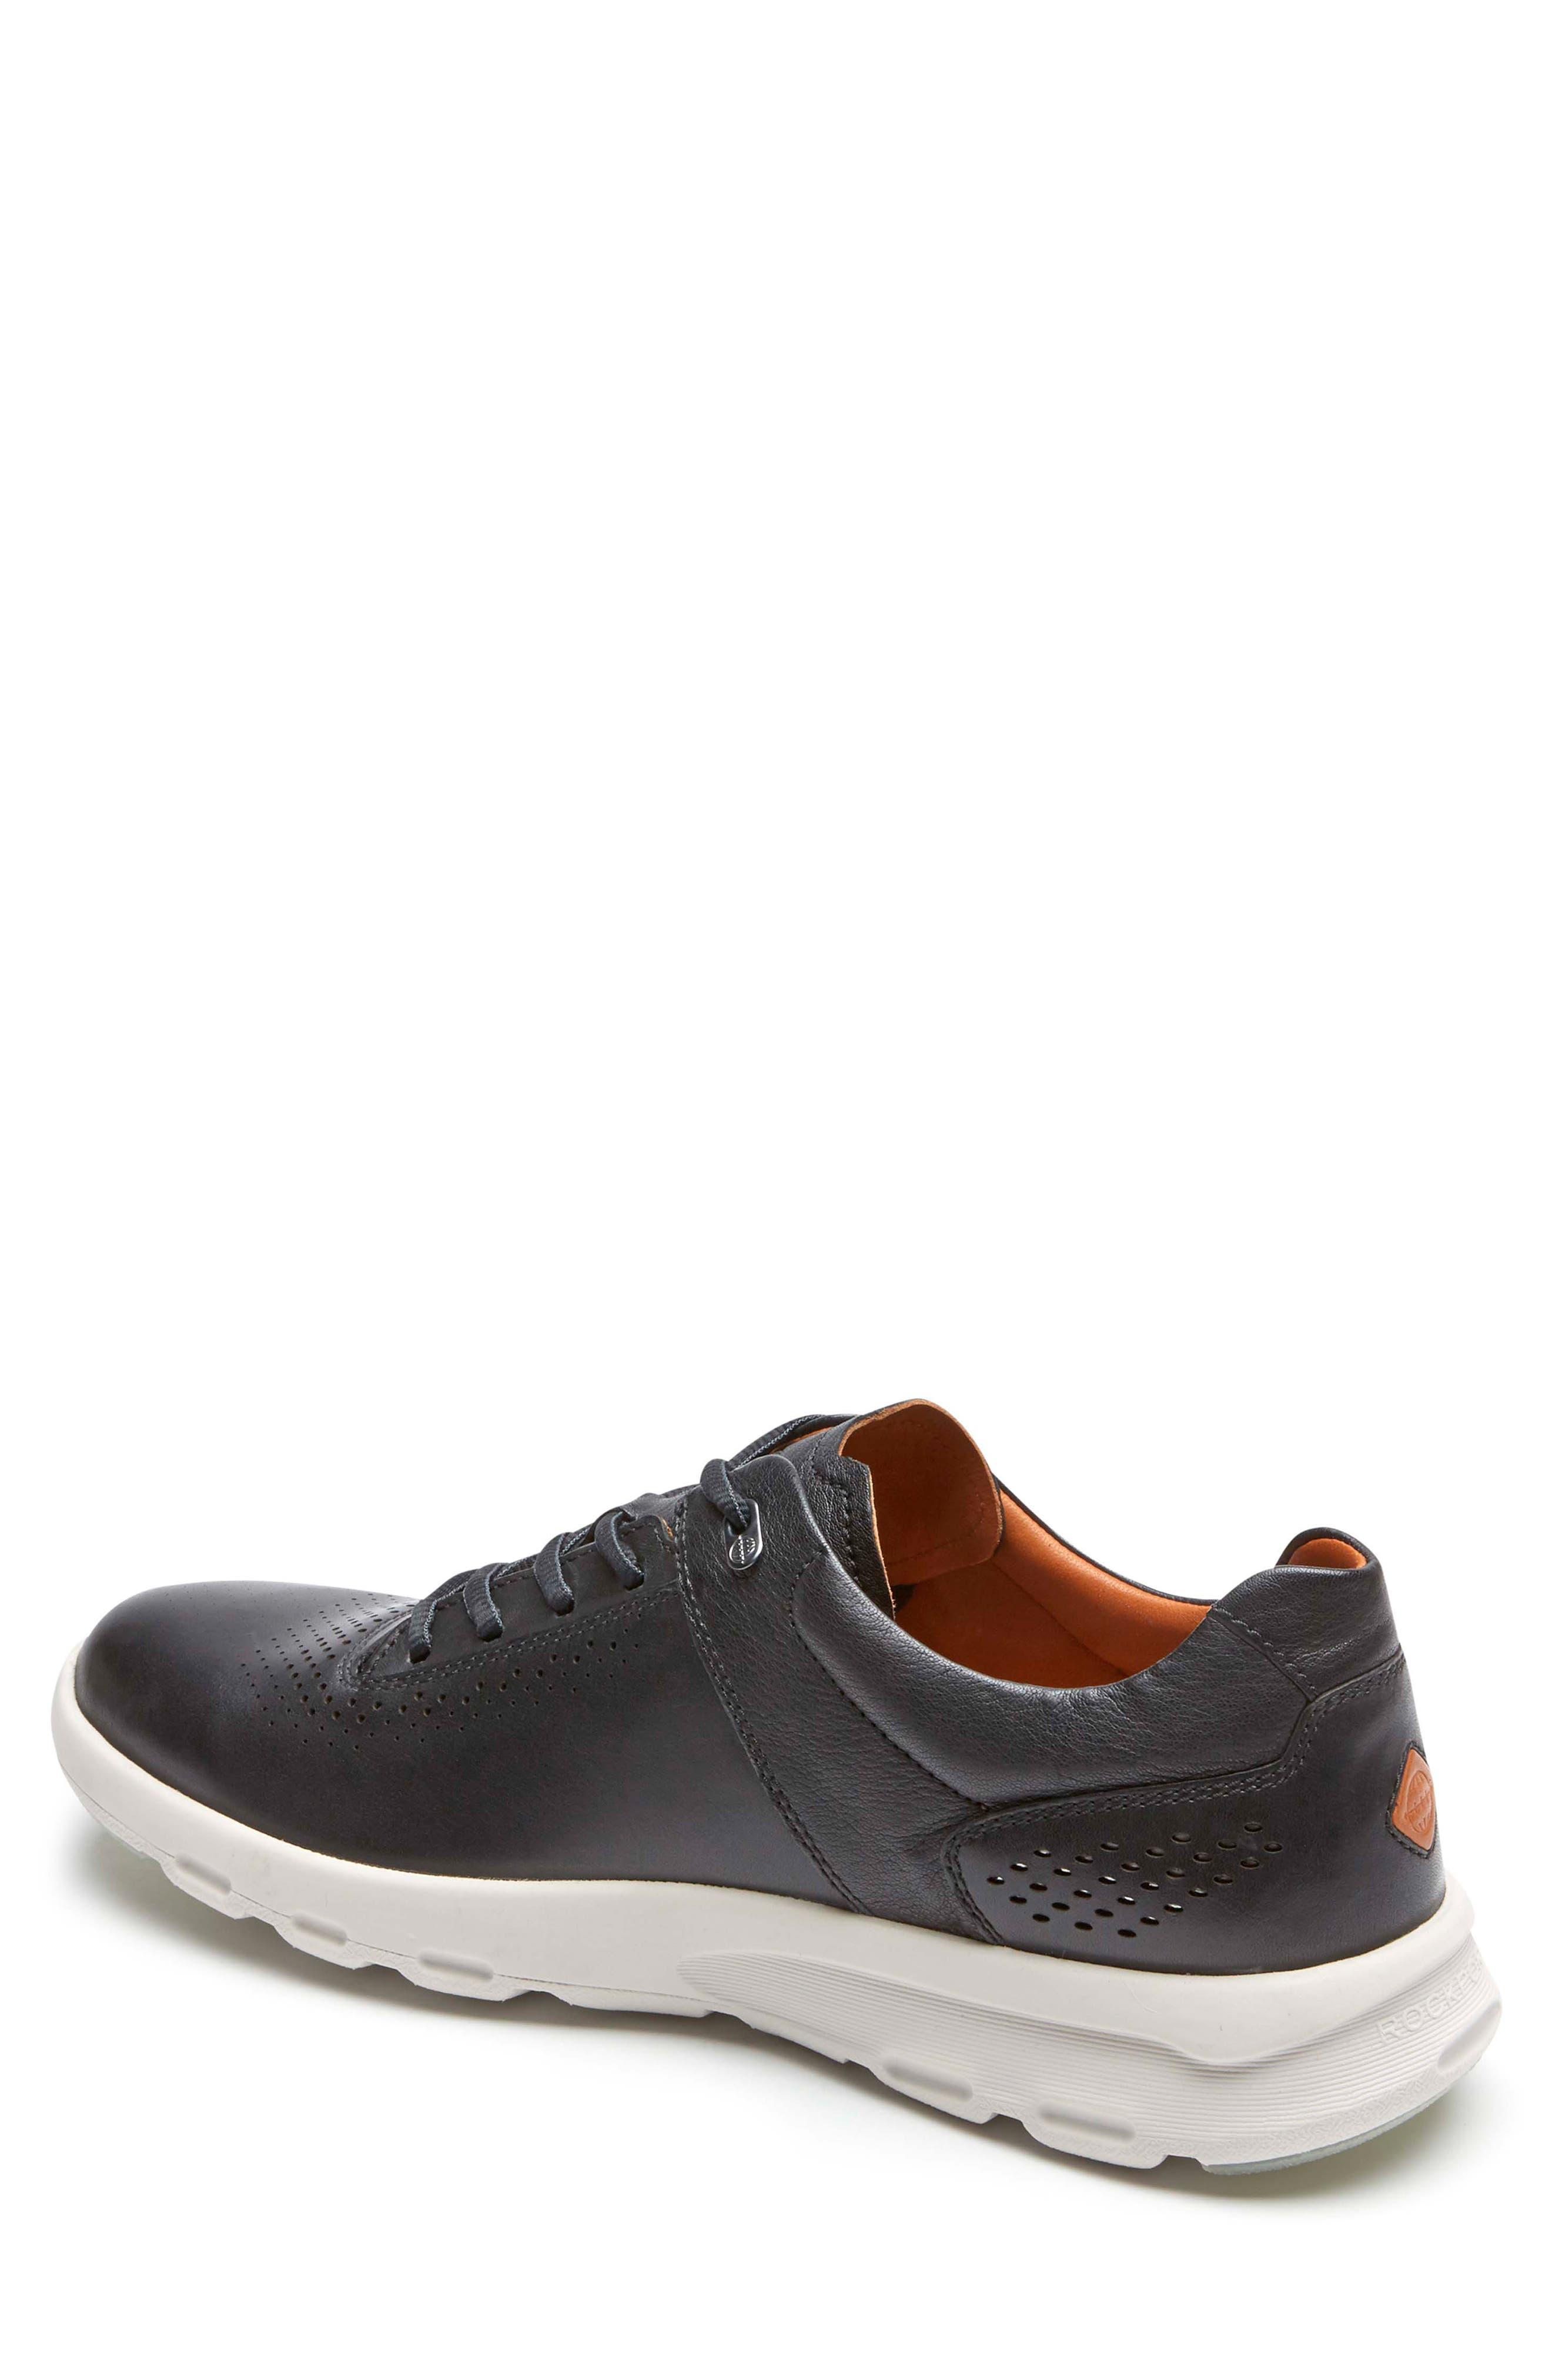 Let's Walk<sup>®</sup> Sneaker,                             Alternate thumbnail 2, color,                             BLACK LEATHER